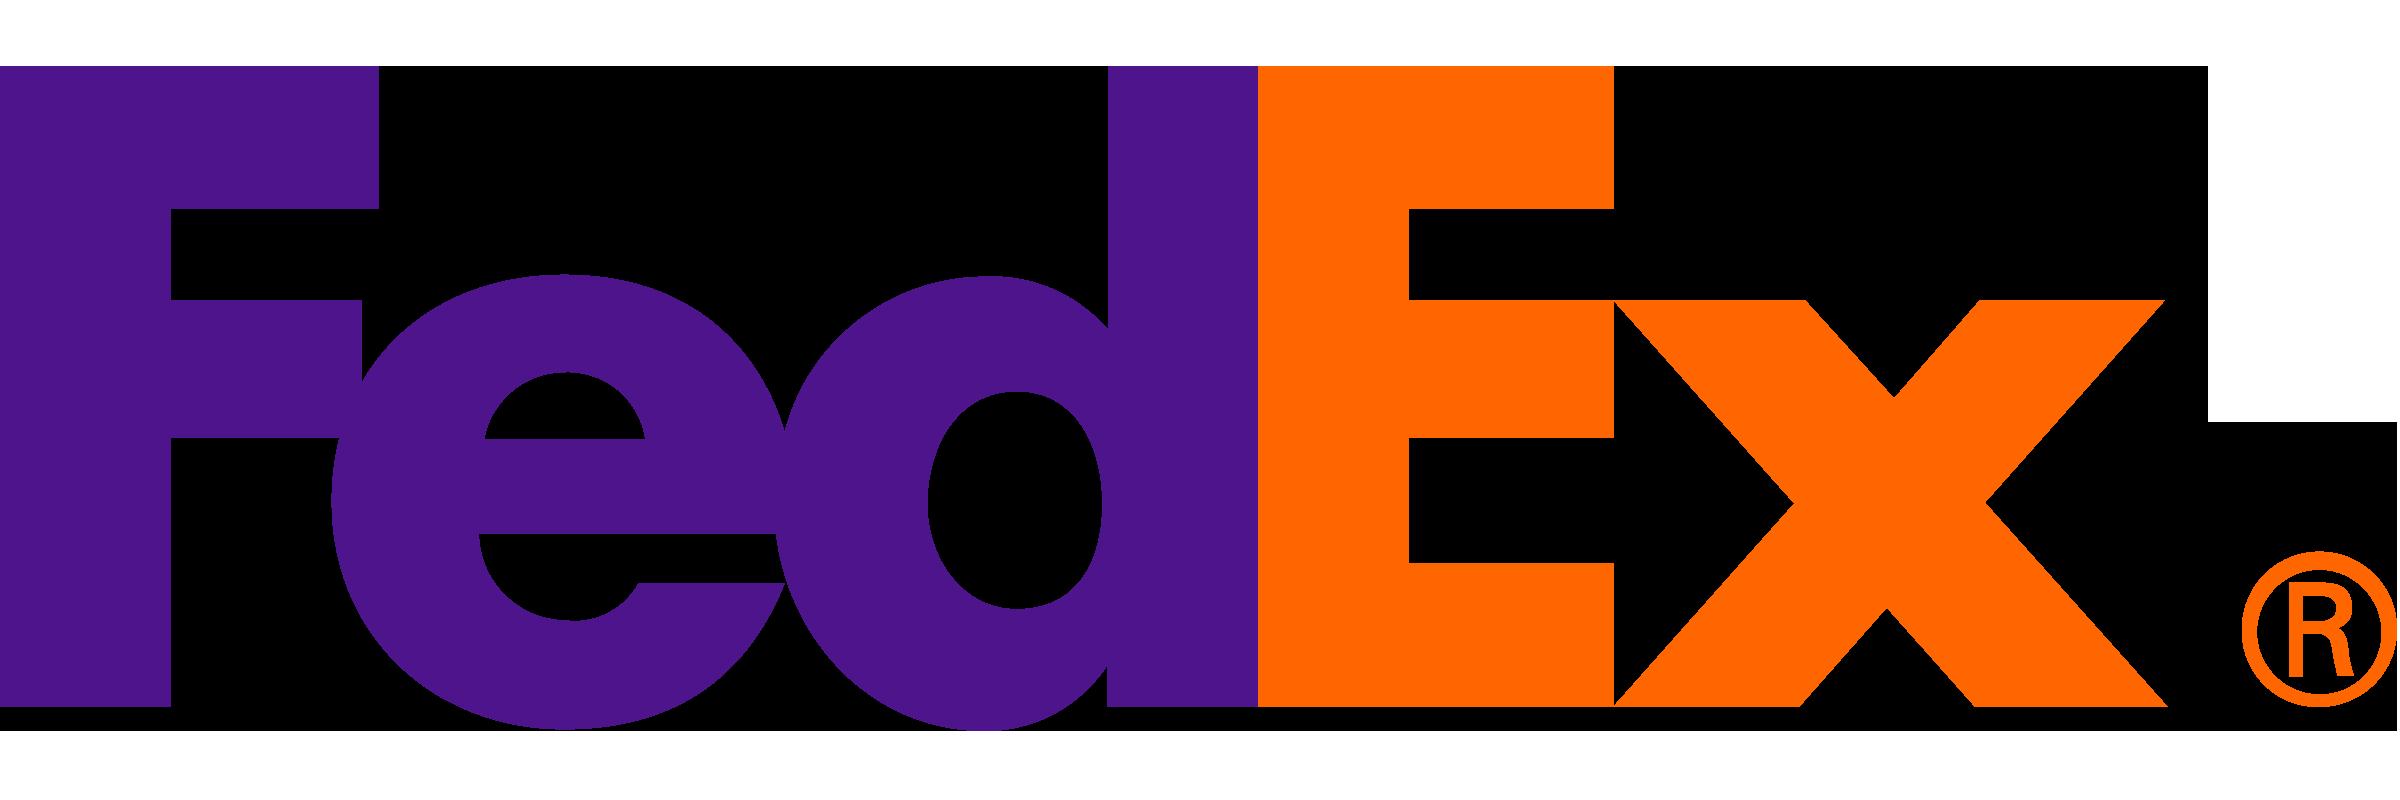 FedEx Logo PNG Transparent & SVG Vector.